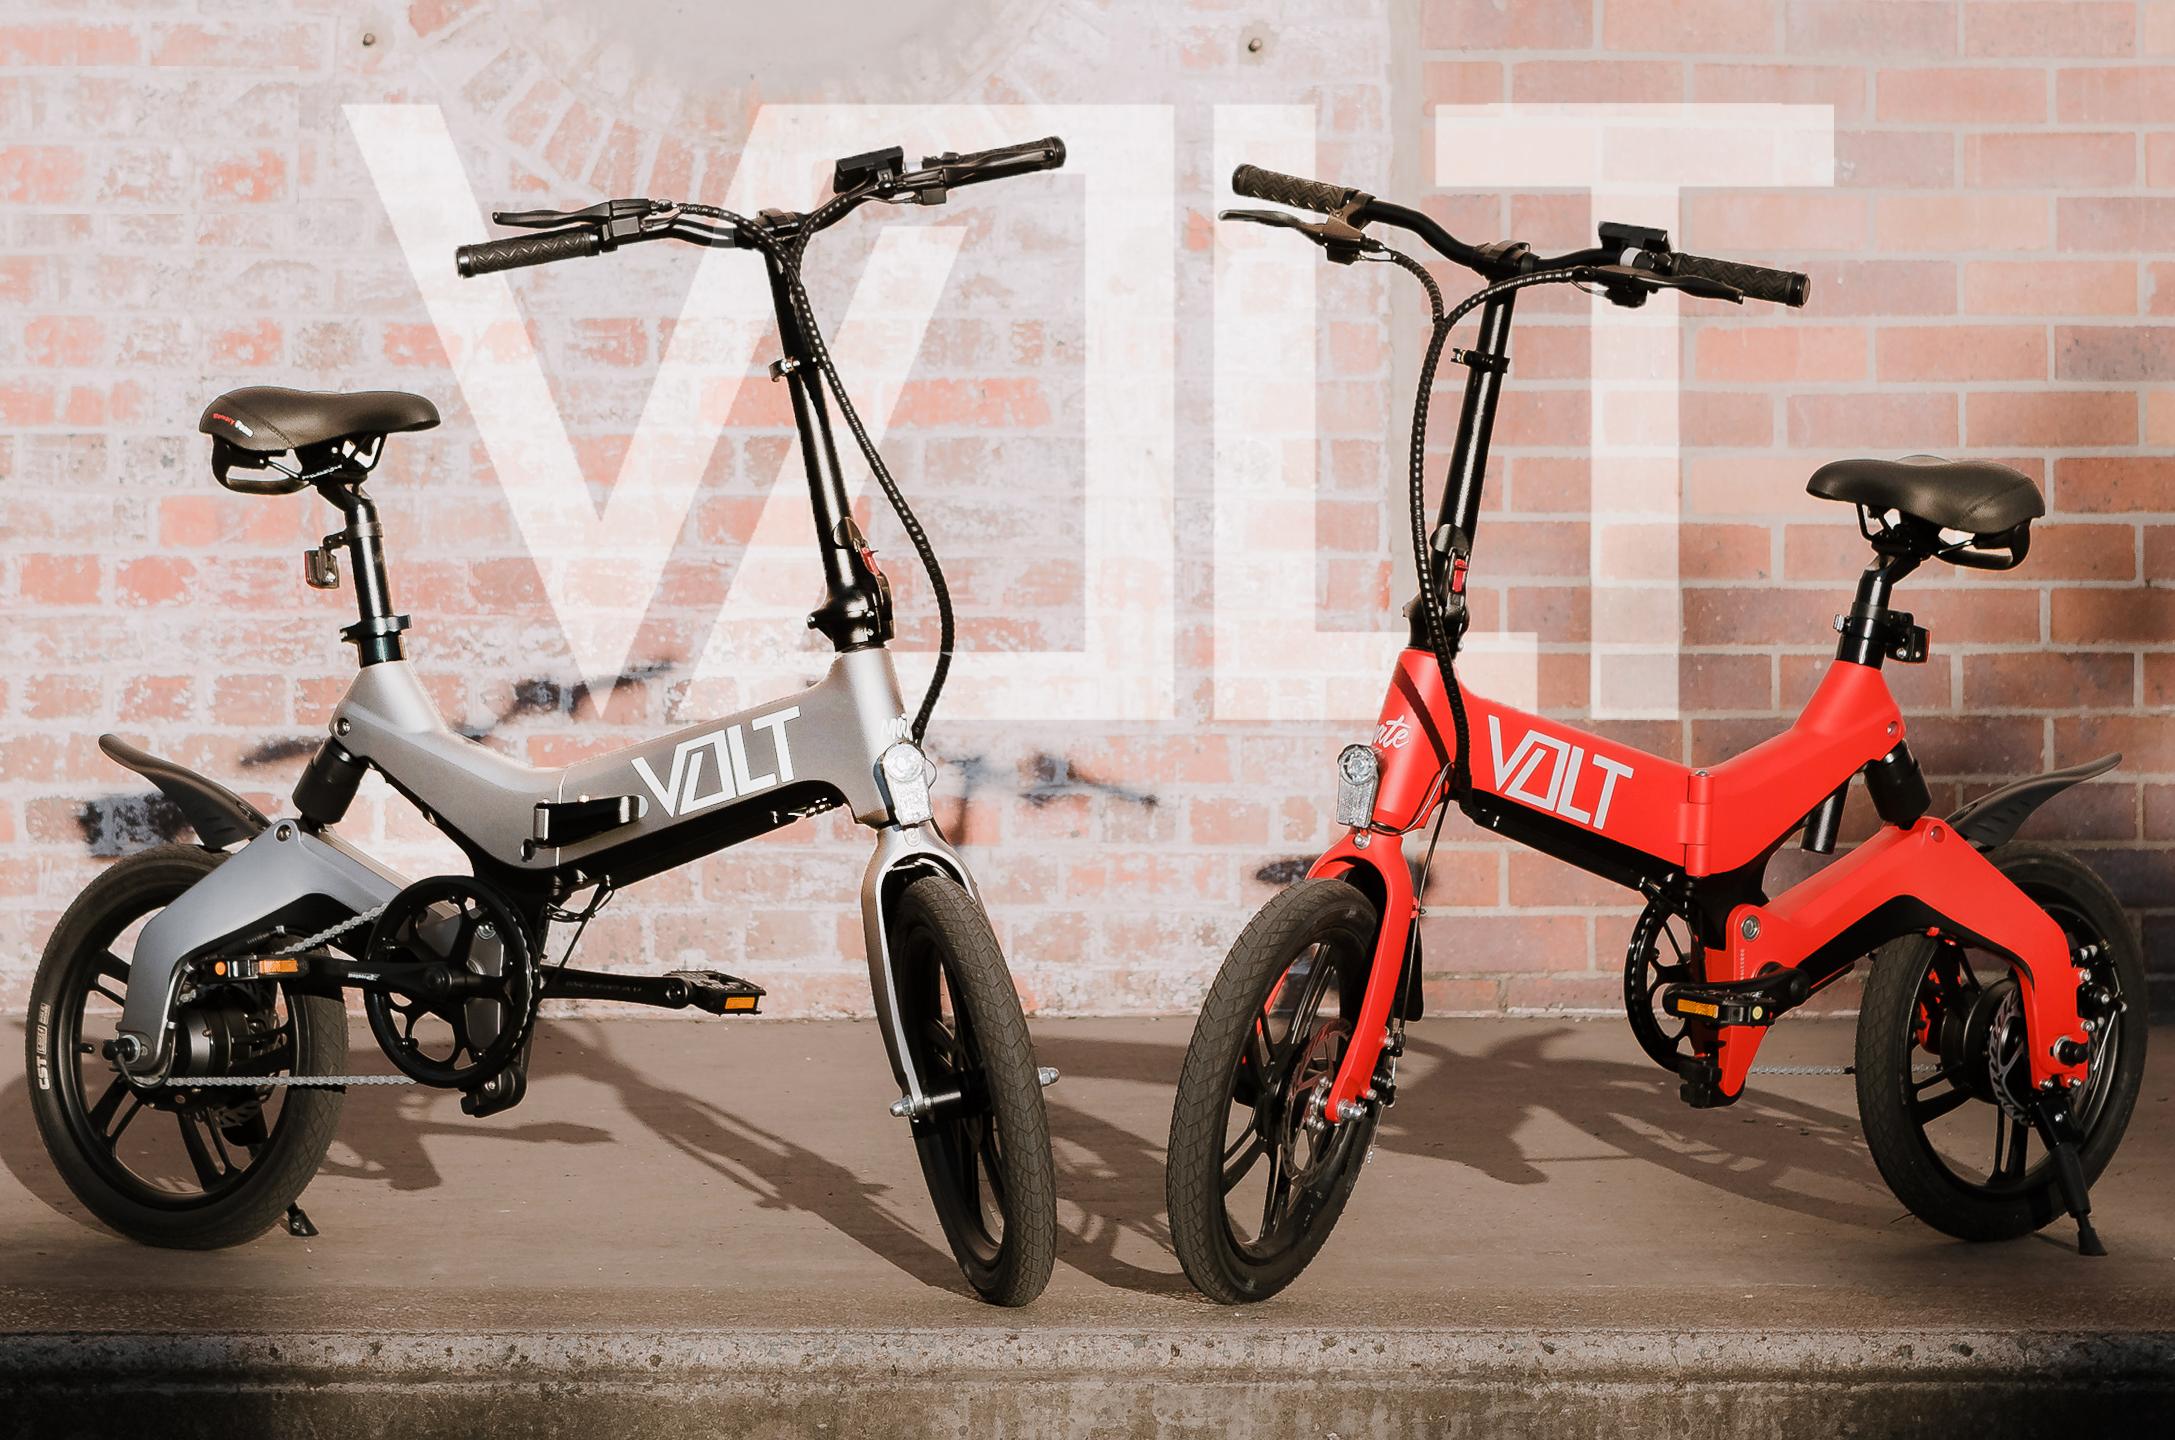 The VOLT 250 folding electric bike in